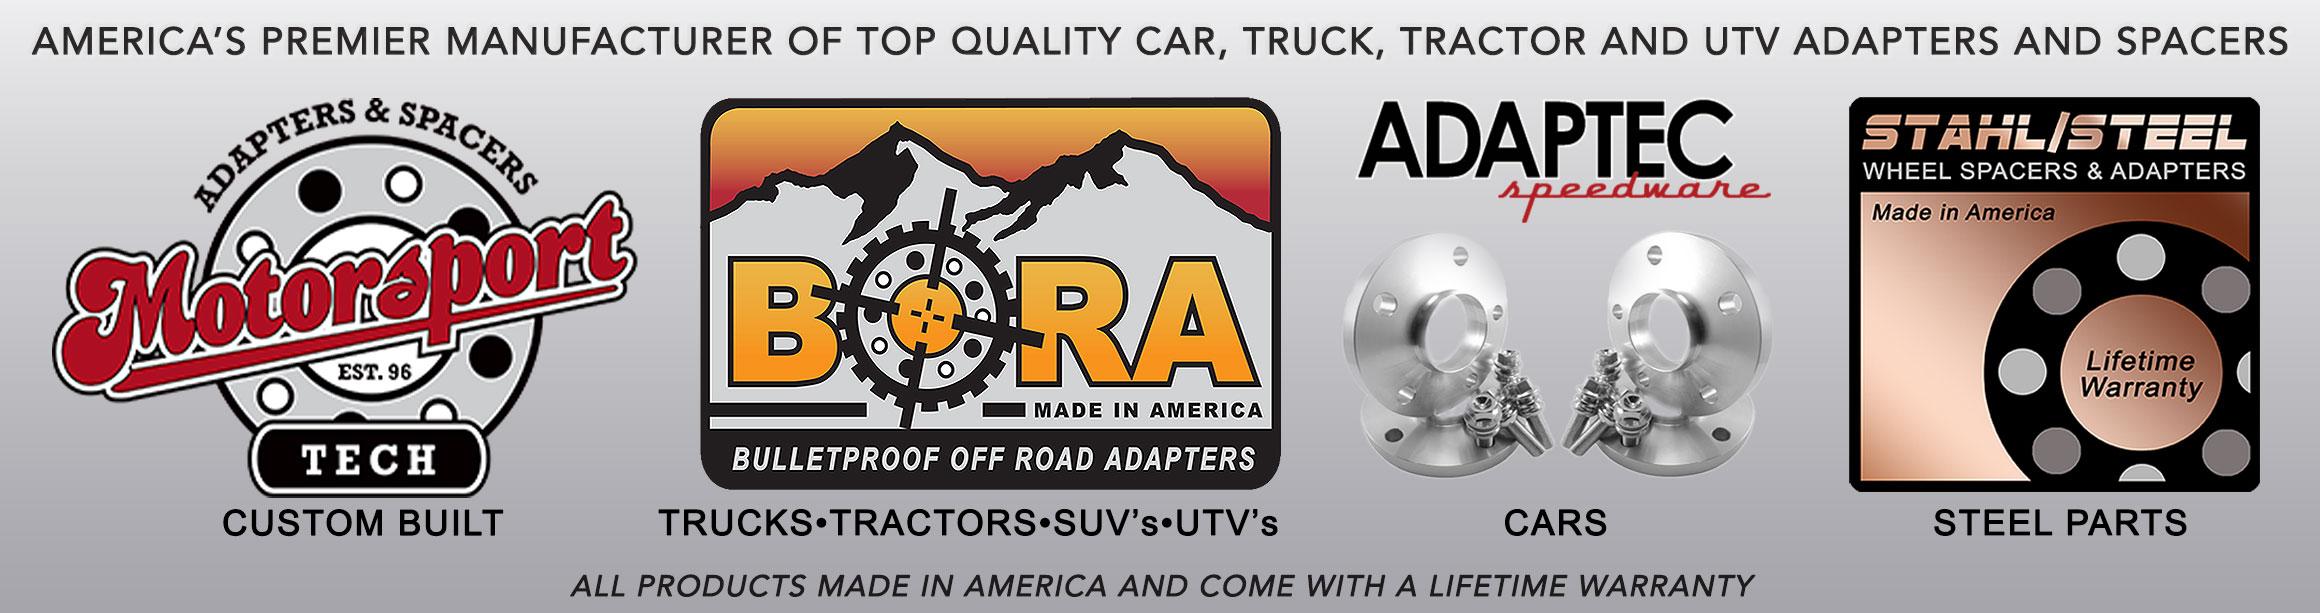 Custom Wheel Adapters, Wheel Spacers, Hub Rings for your car